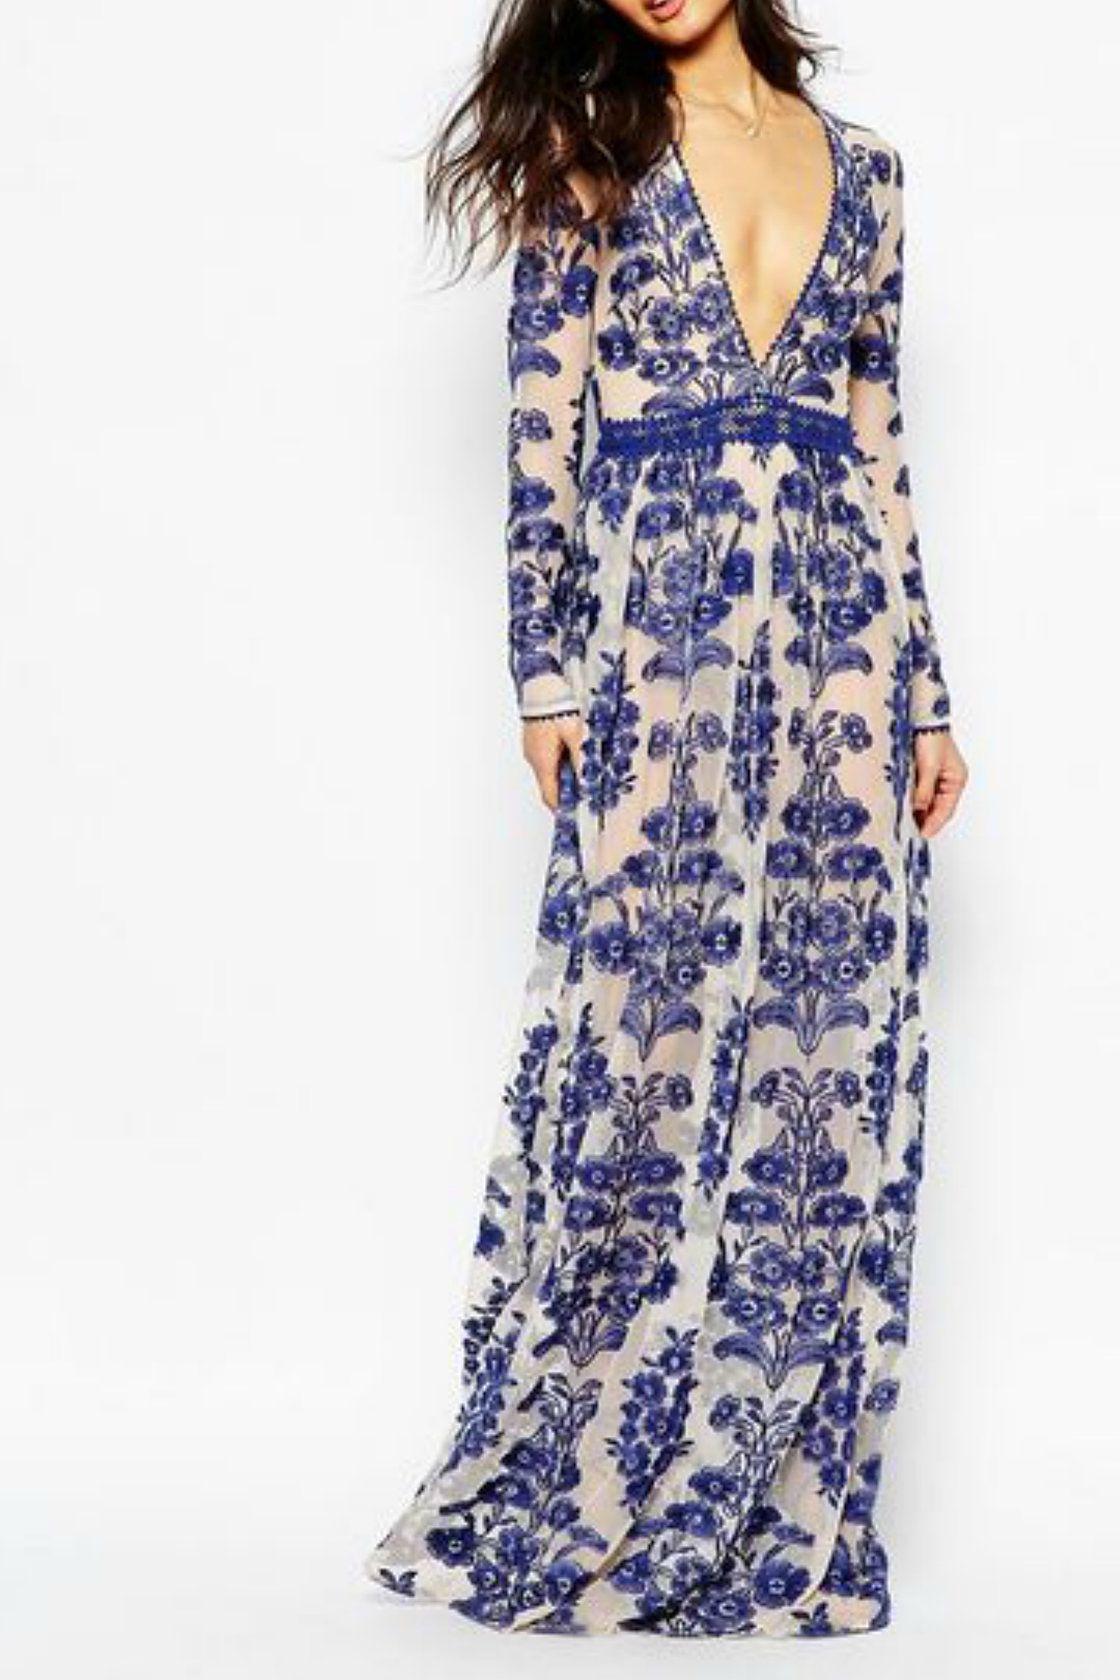 On the blog  Beautiful Bohemian Maxi Dresses More cf706a1e463